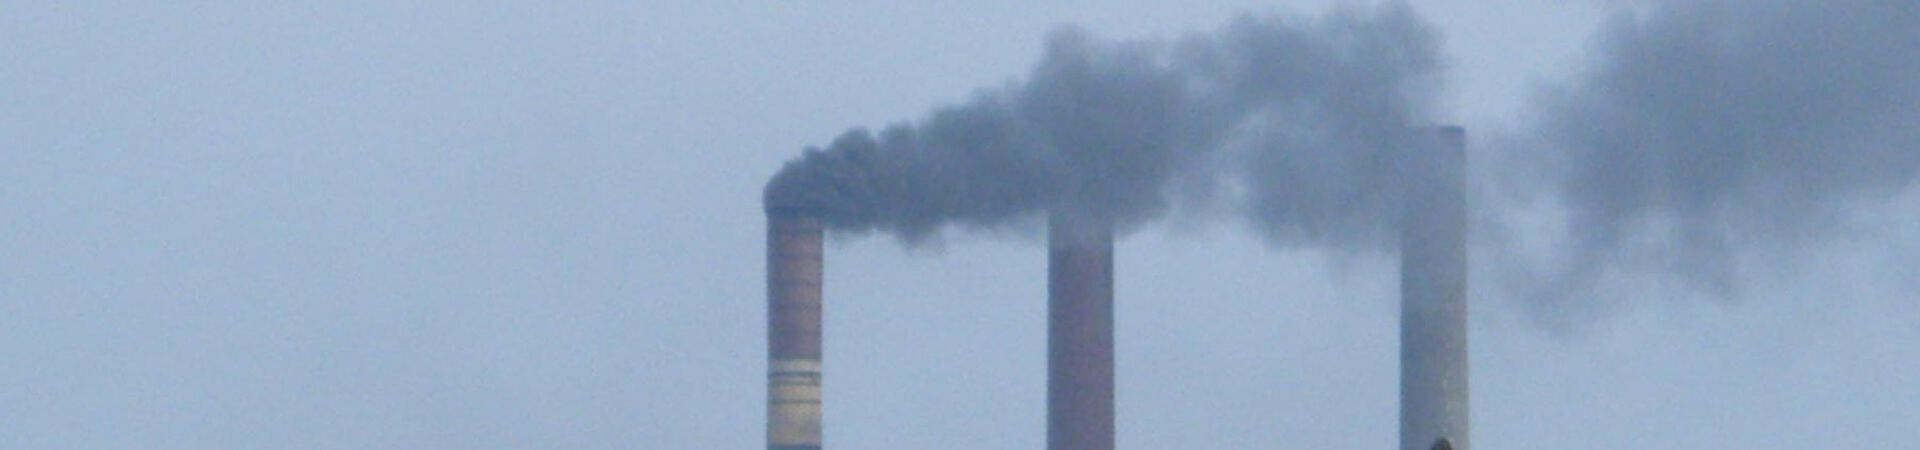 Banner - The Clean Air Coalition